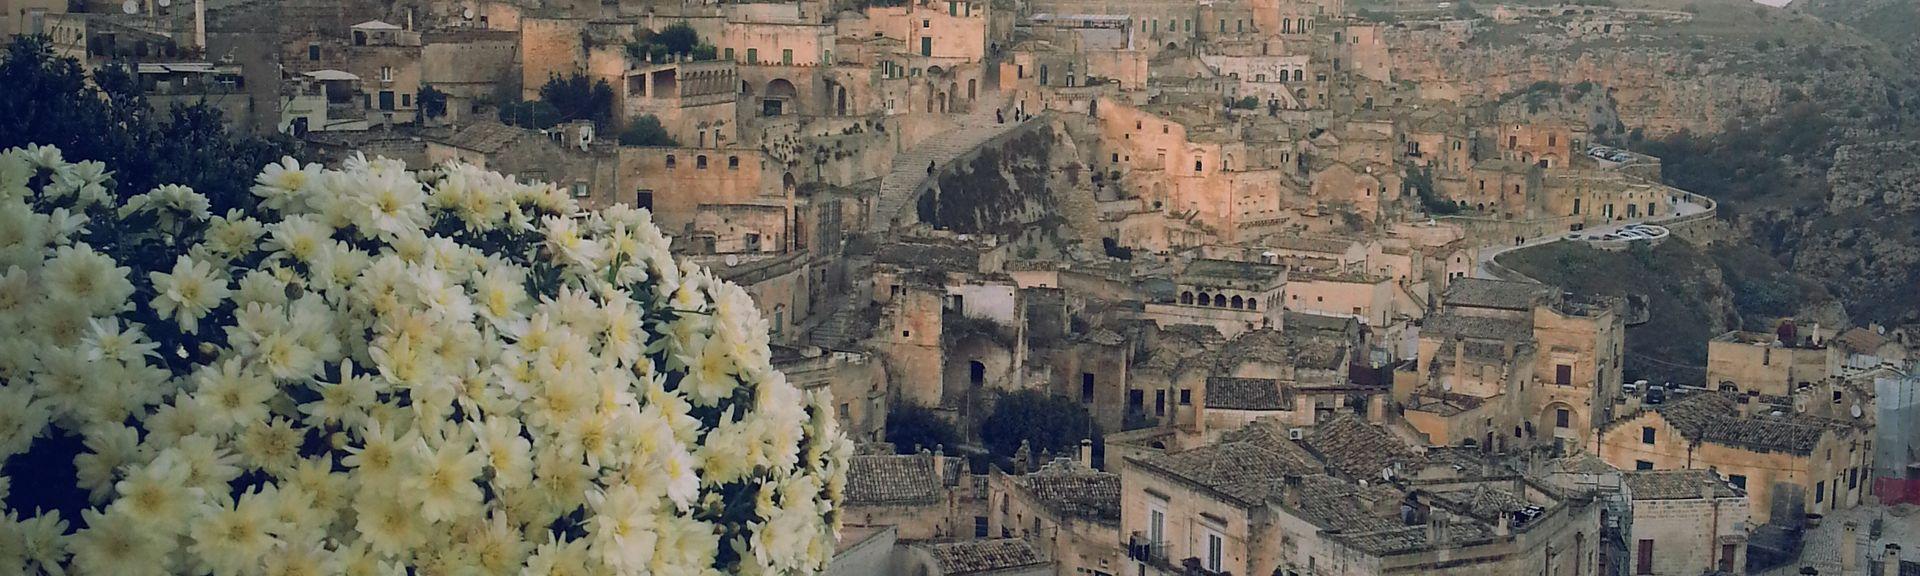 Scanzano Jonico, Matera, Basilicata, Italy